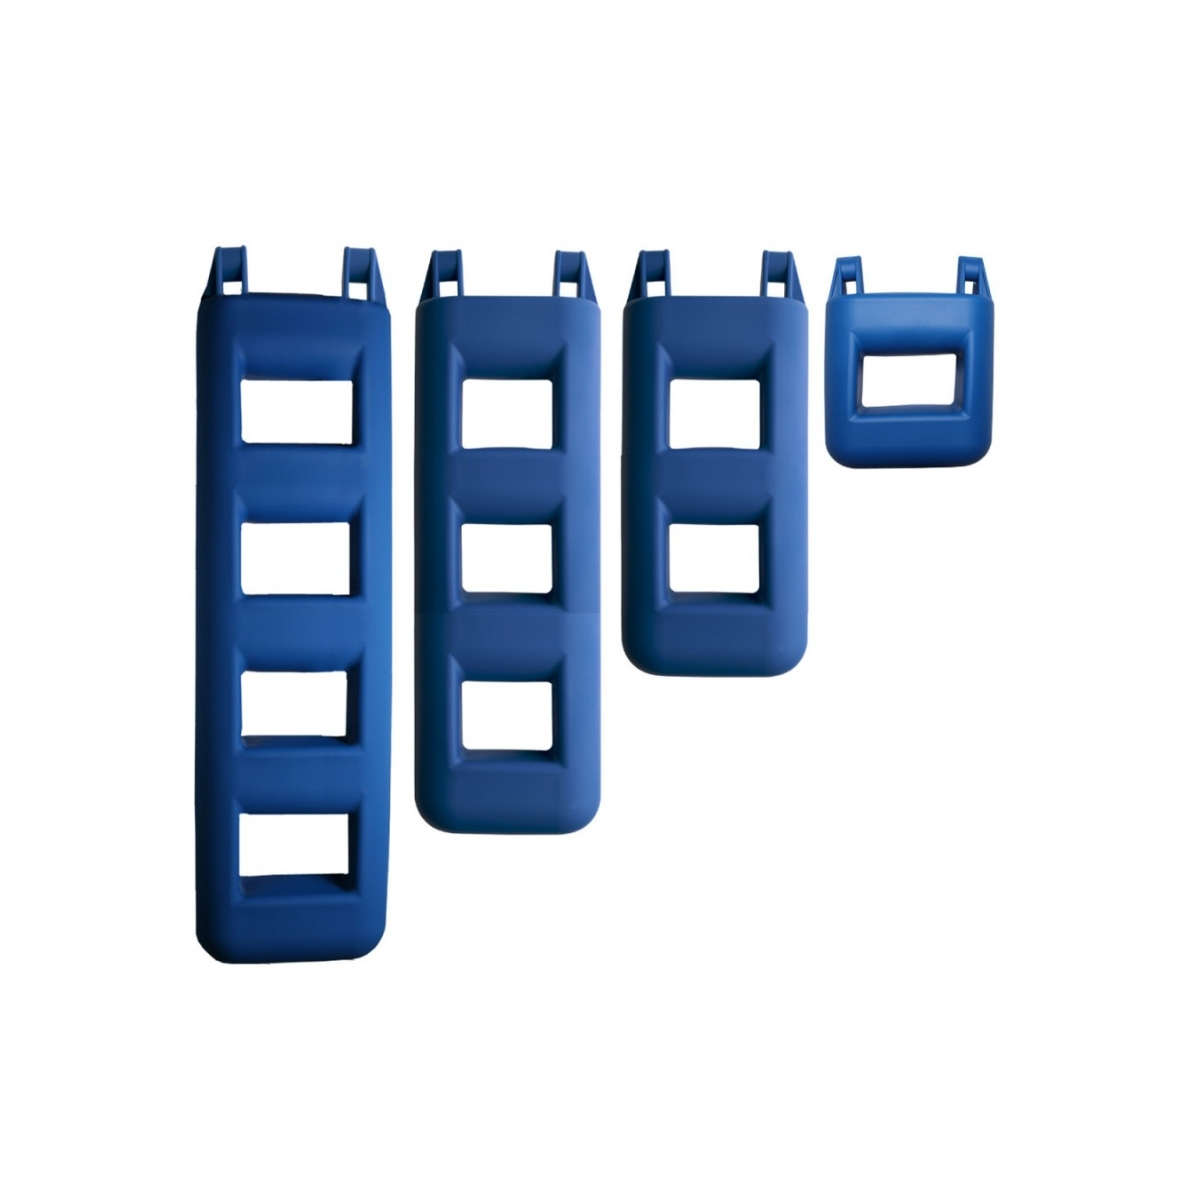 Fender ladders